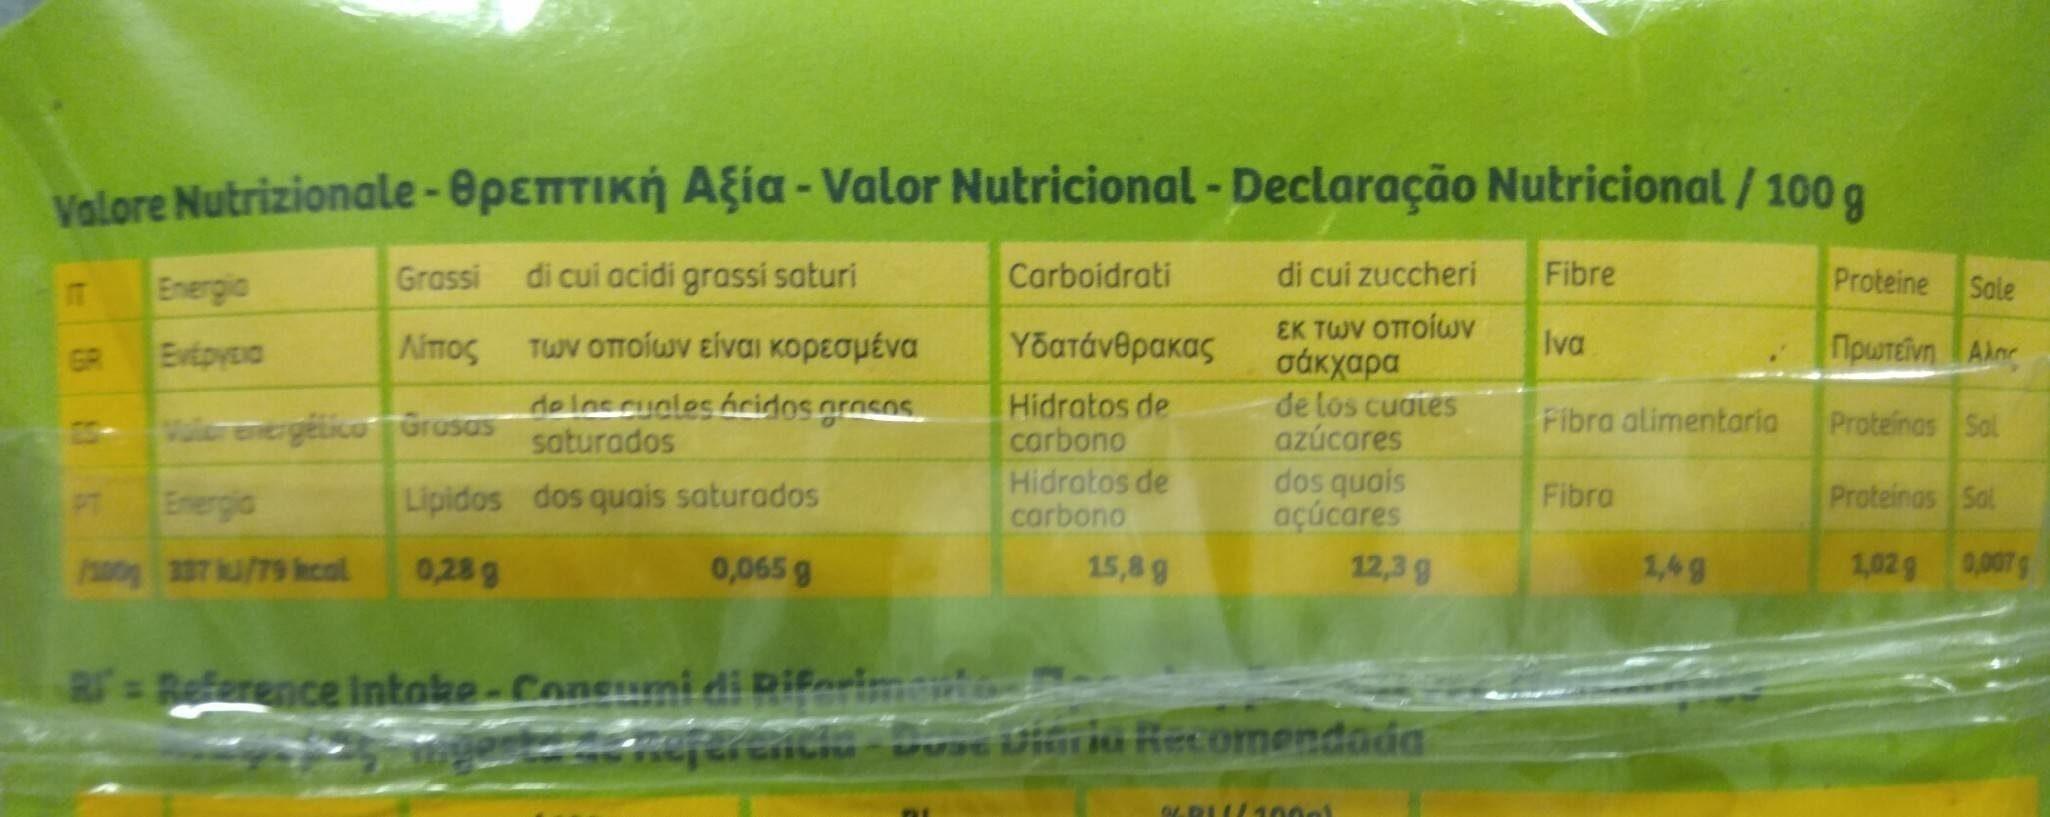 Kiwi sungold - Nutrition facts - es